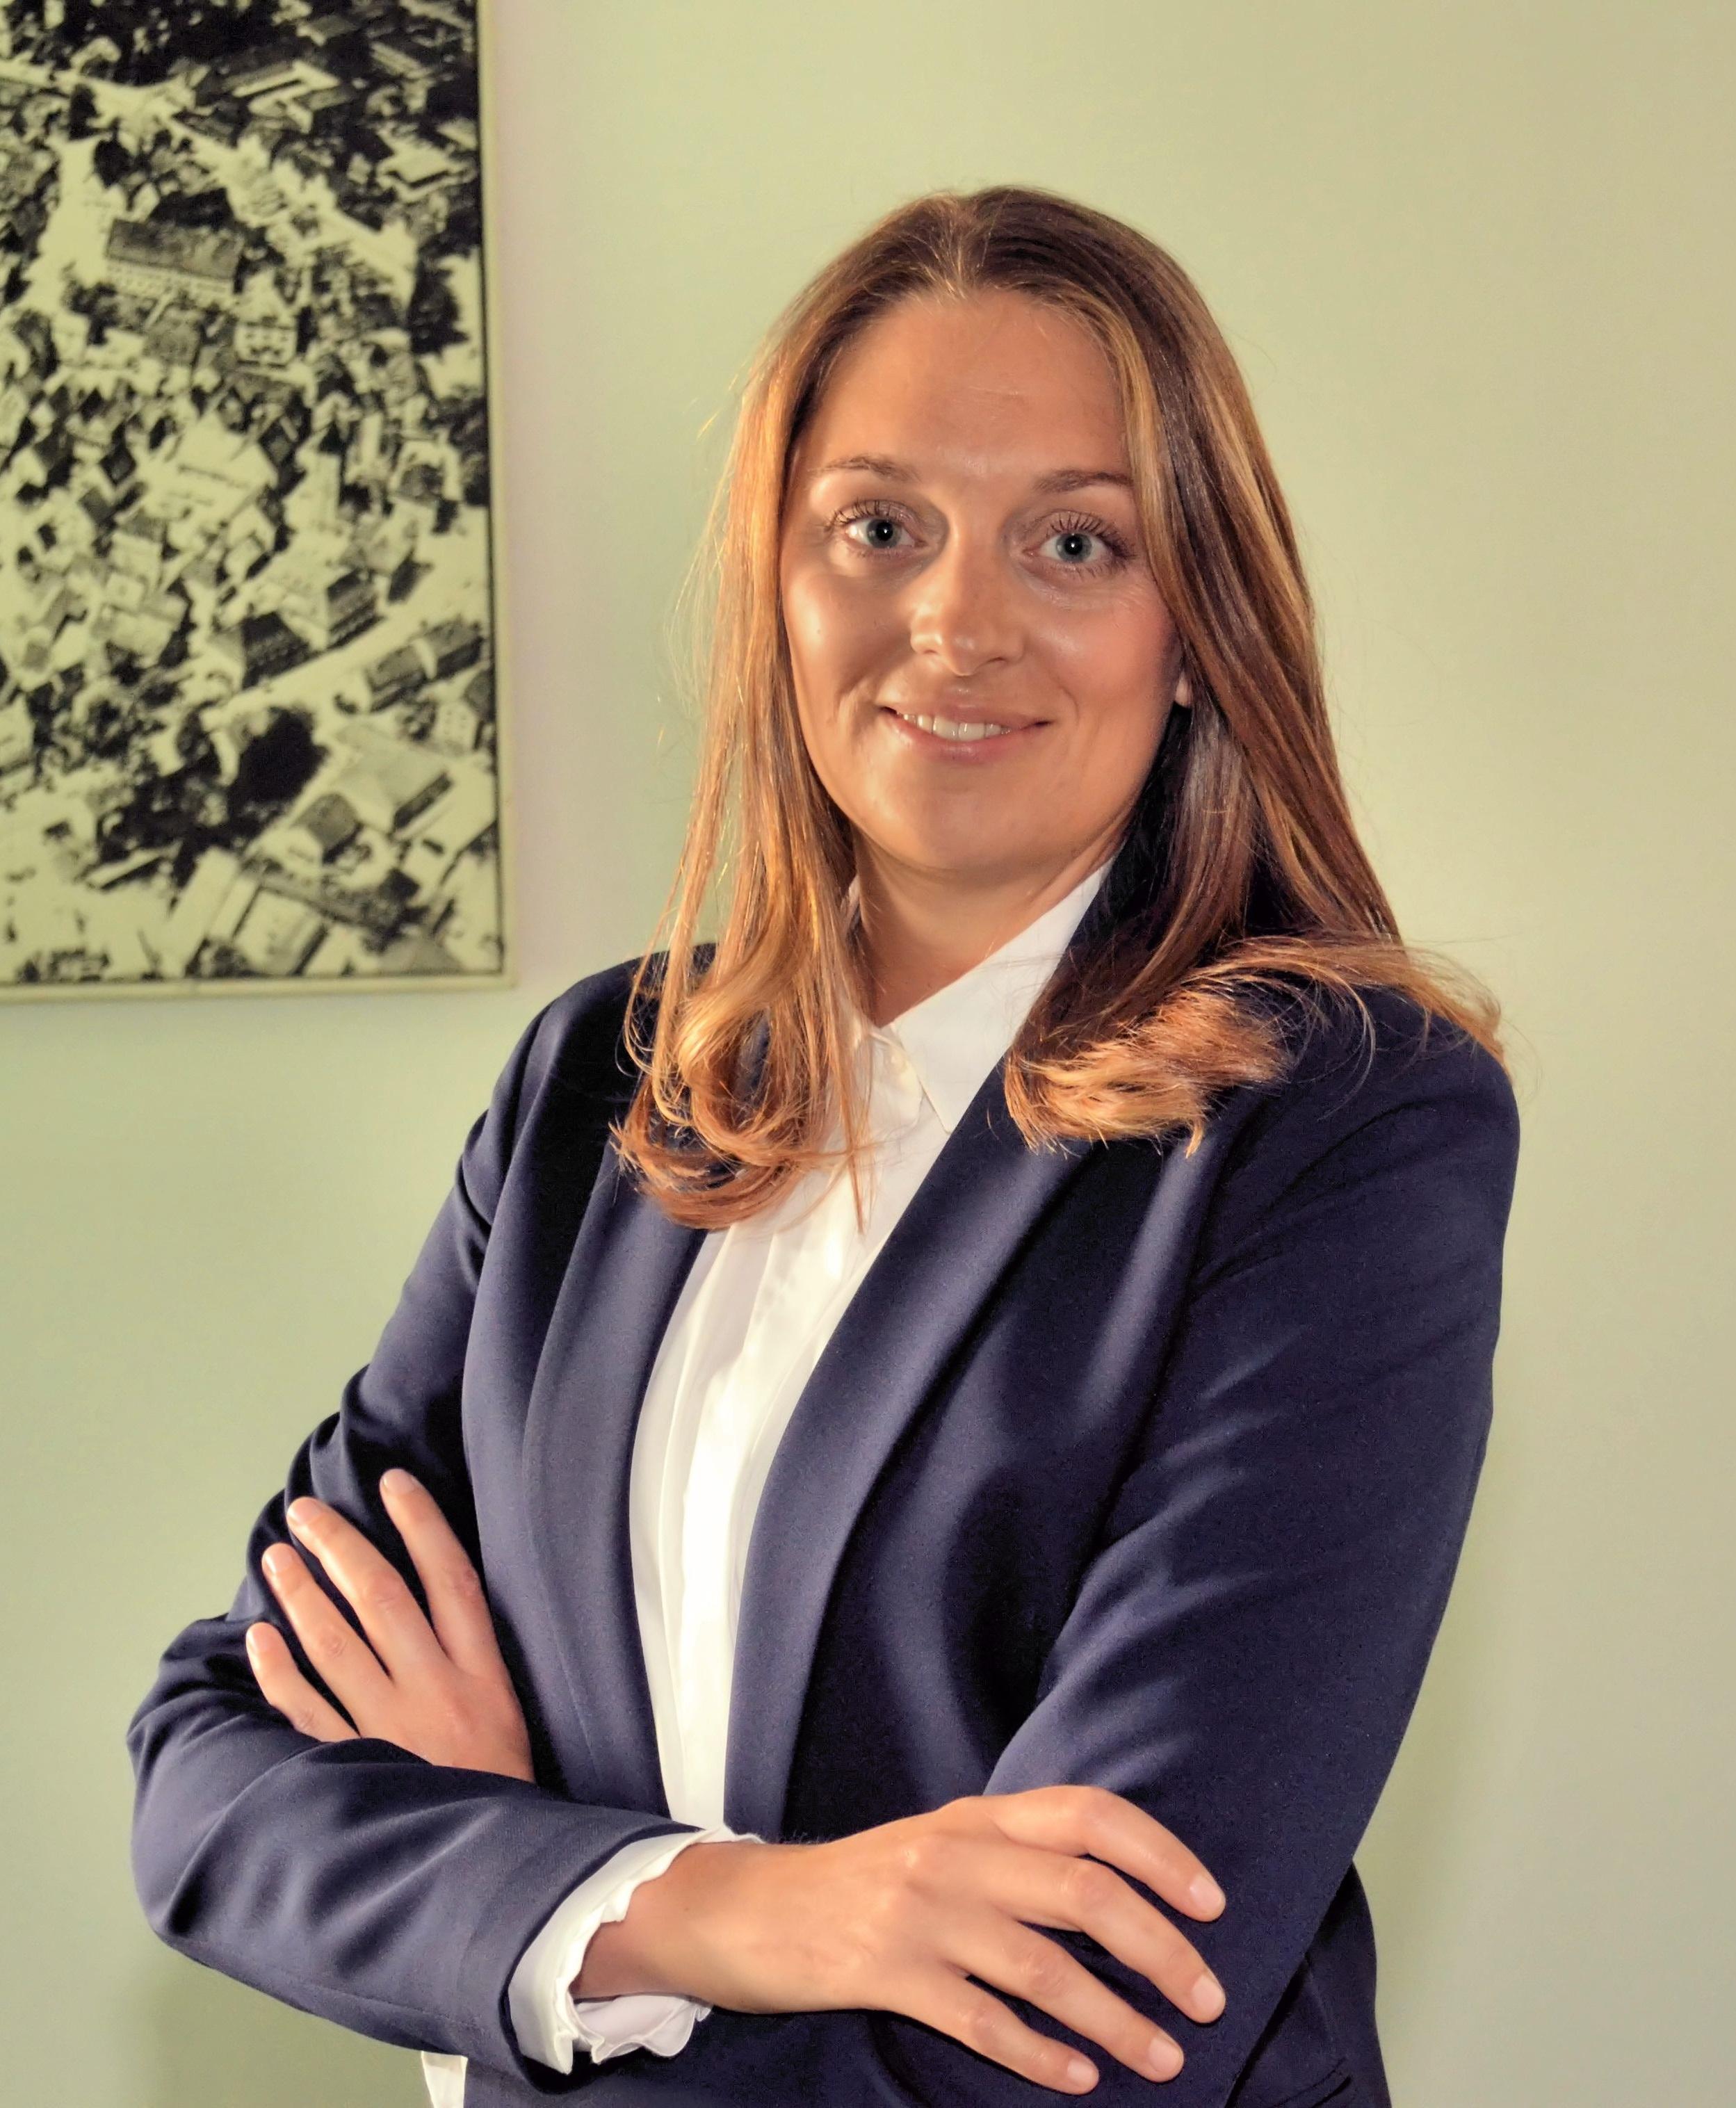 Lara Holzer